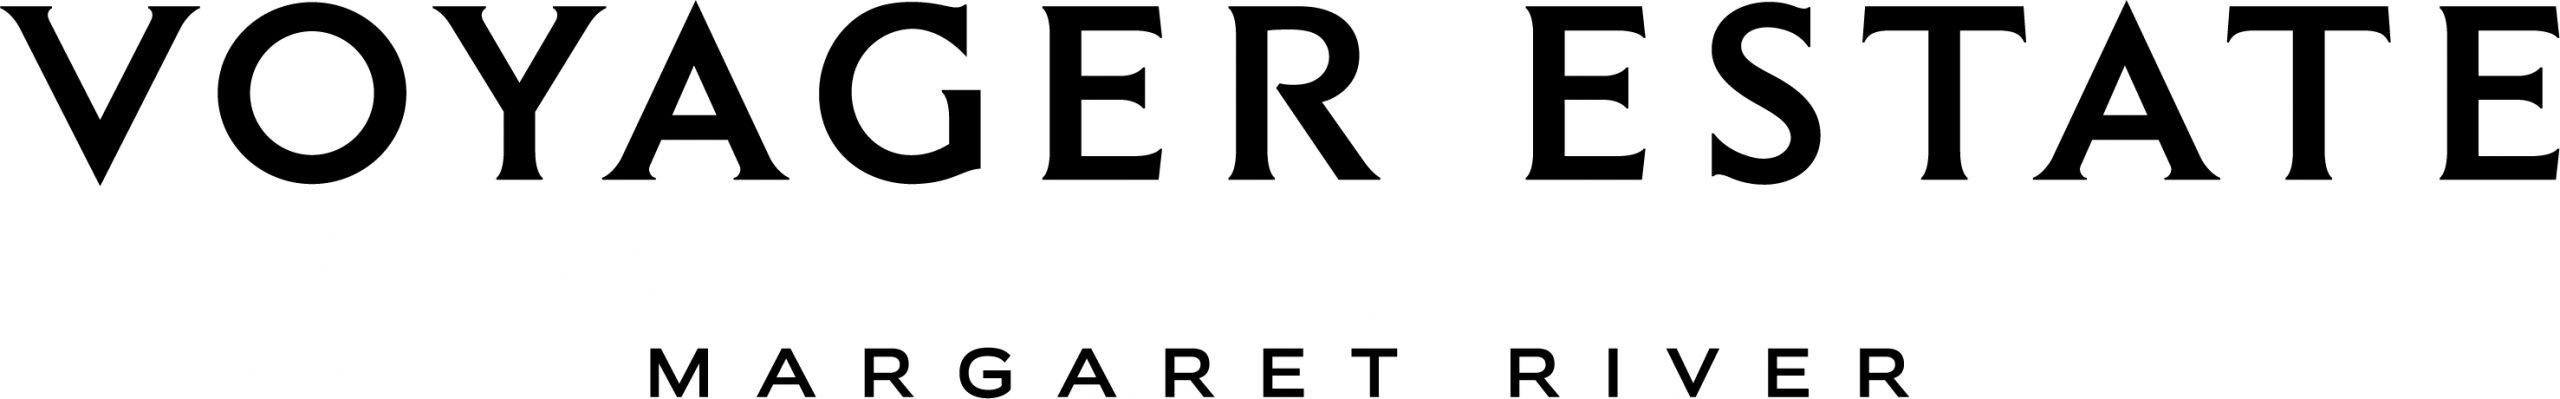 voyager_estate_logo_2019_black